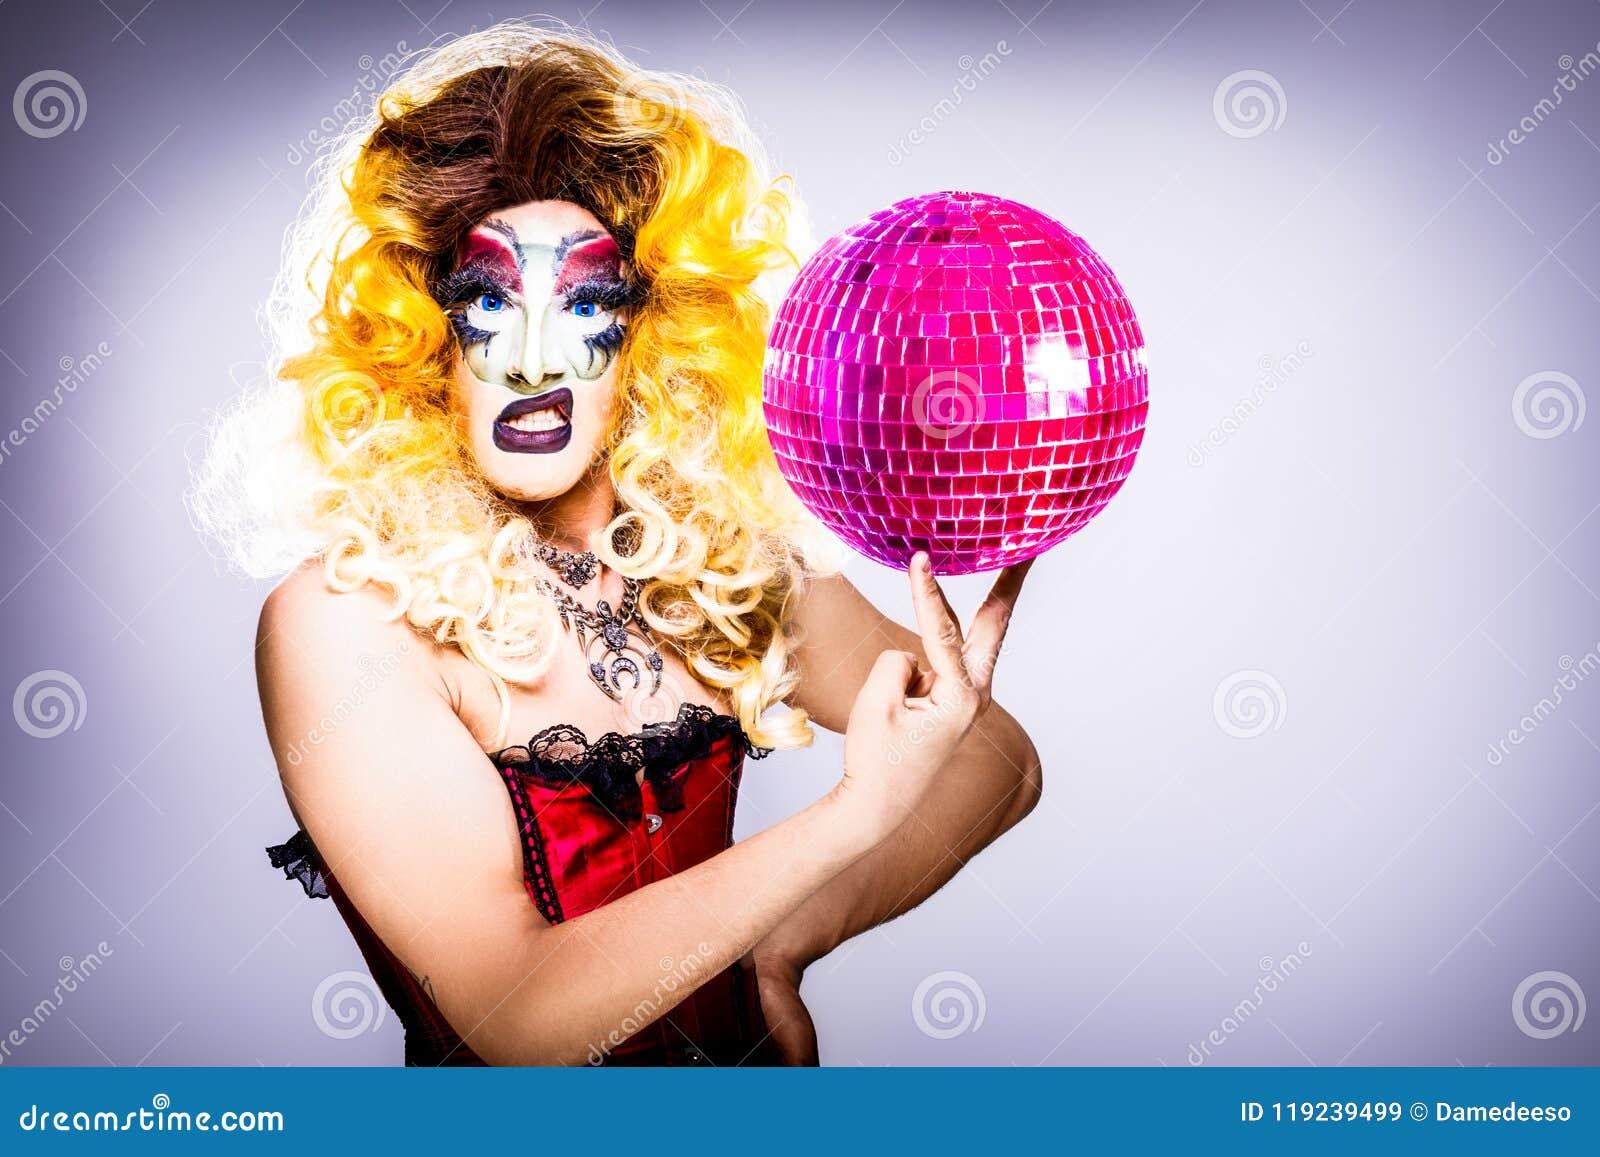 Word ball fetish gay